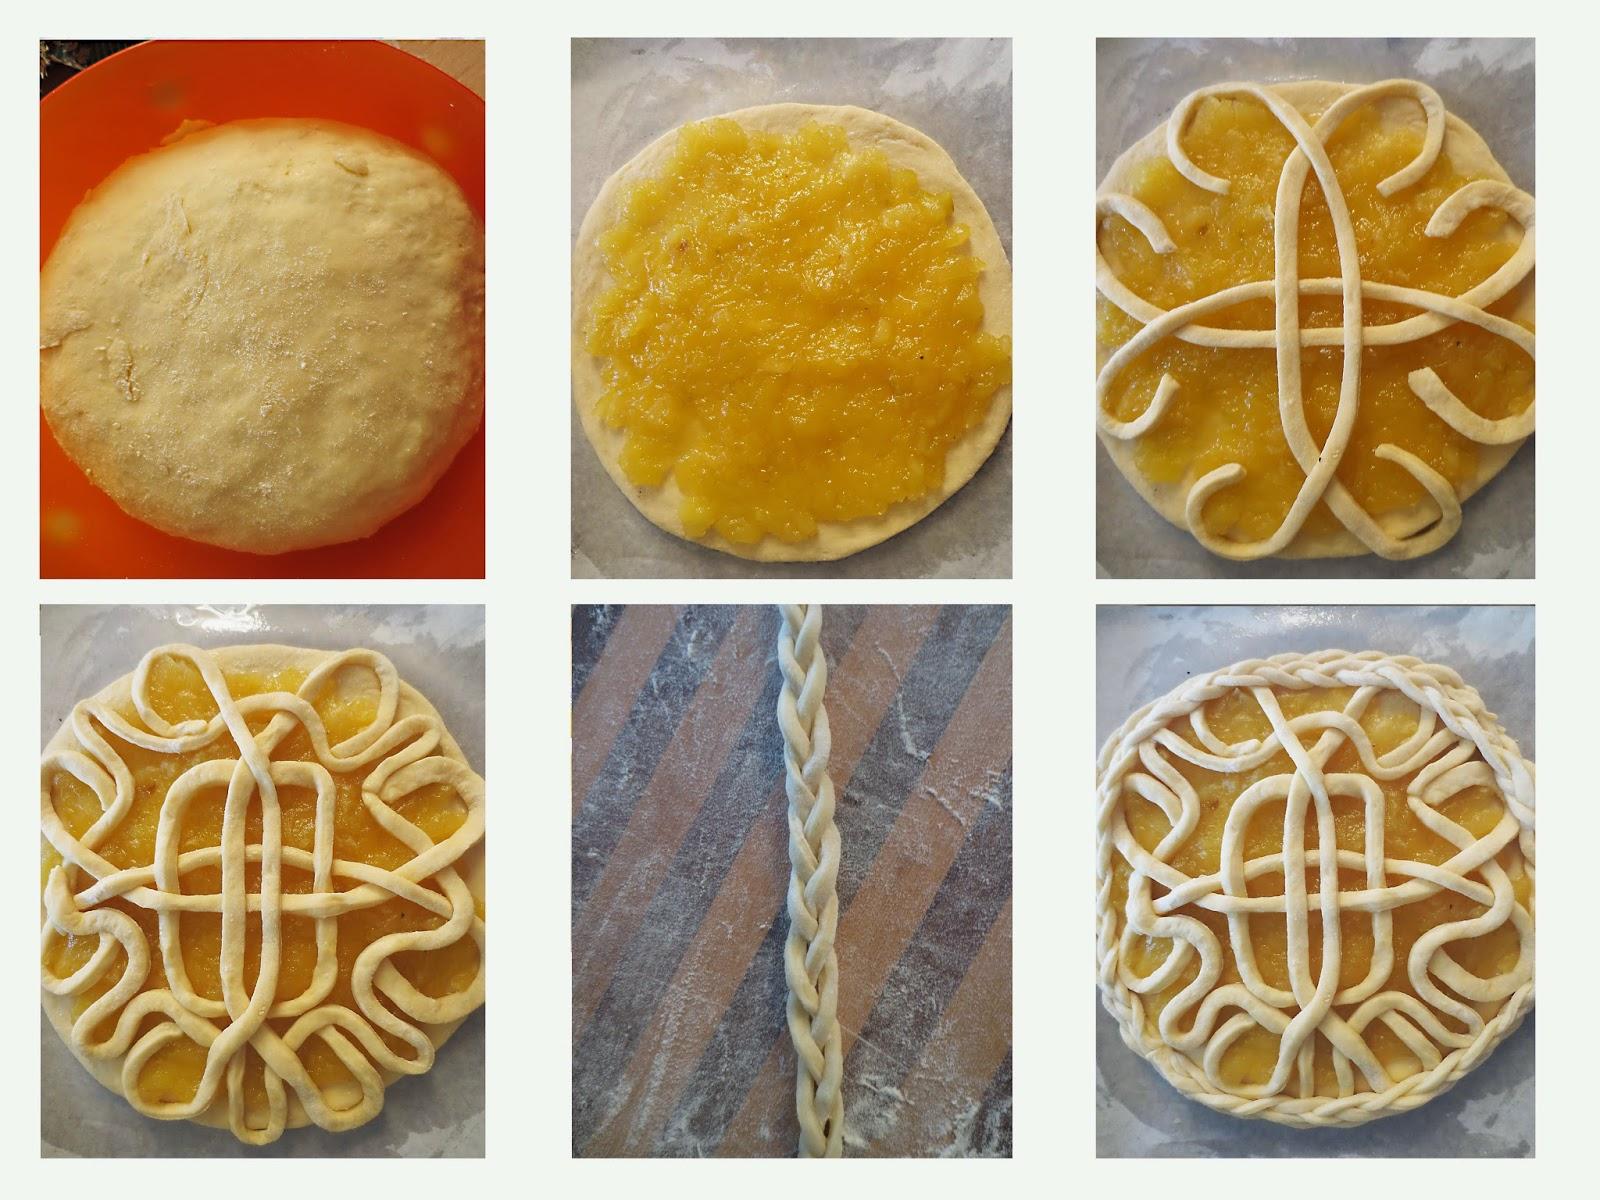 Форма пирожков из дрожжевого теста пошагово